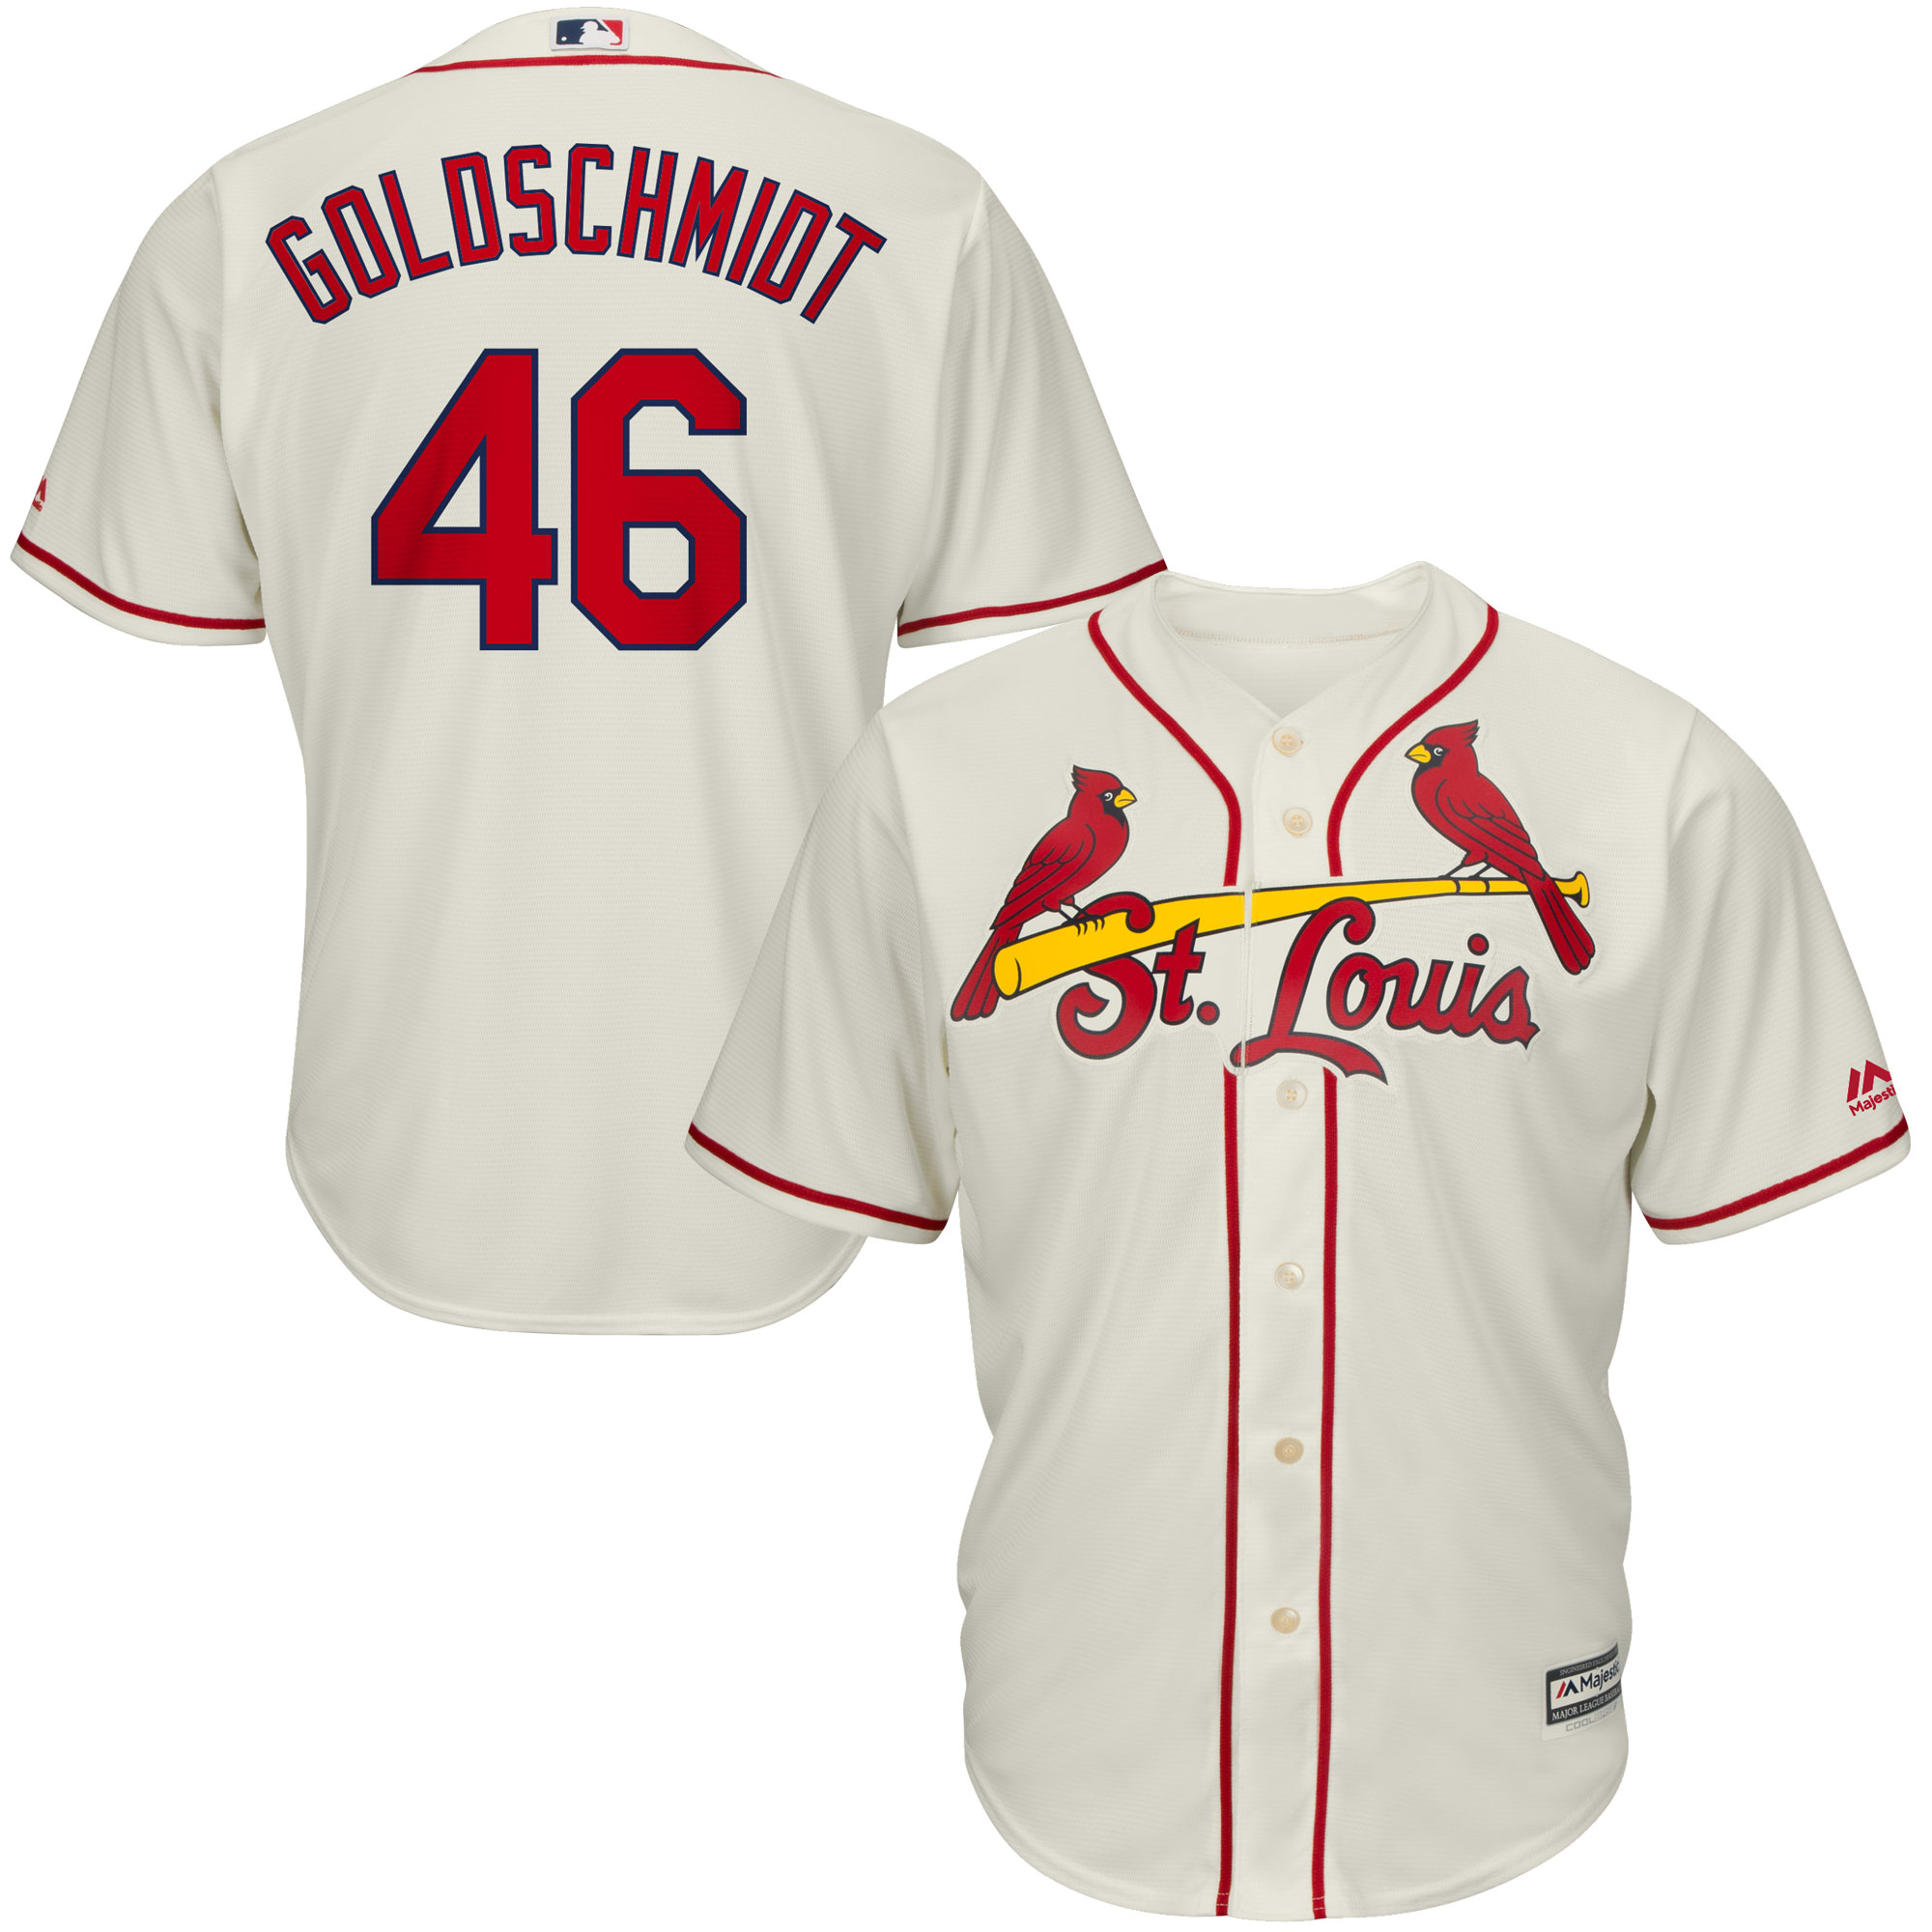 Paul Goldschmidt St. Louis Cardinals Majestic Alternate Official Cool Base Player Jersey - Cream